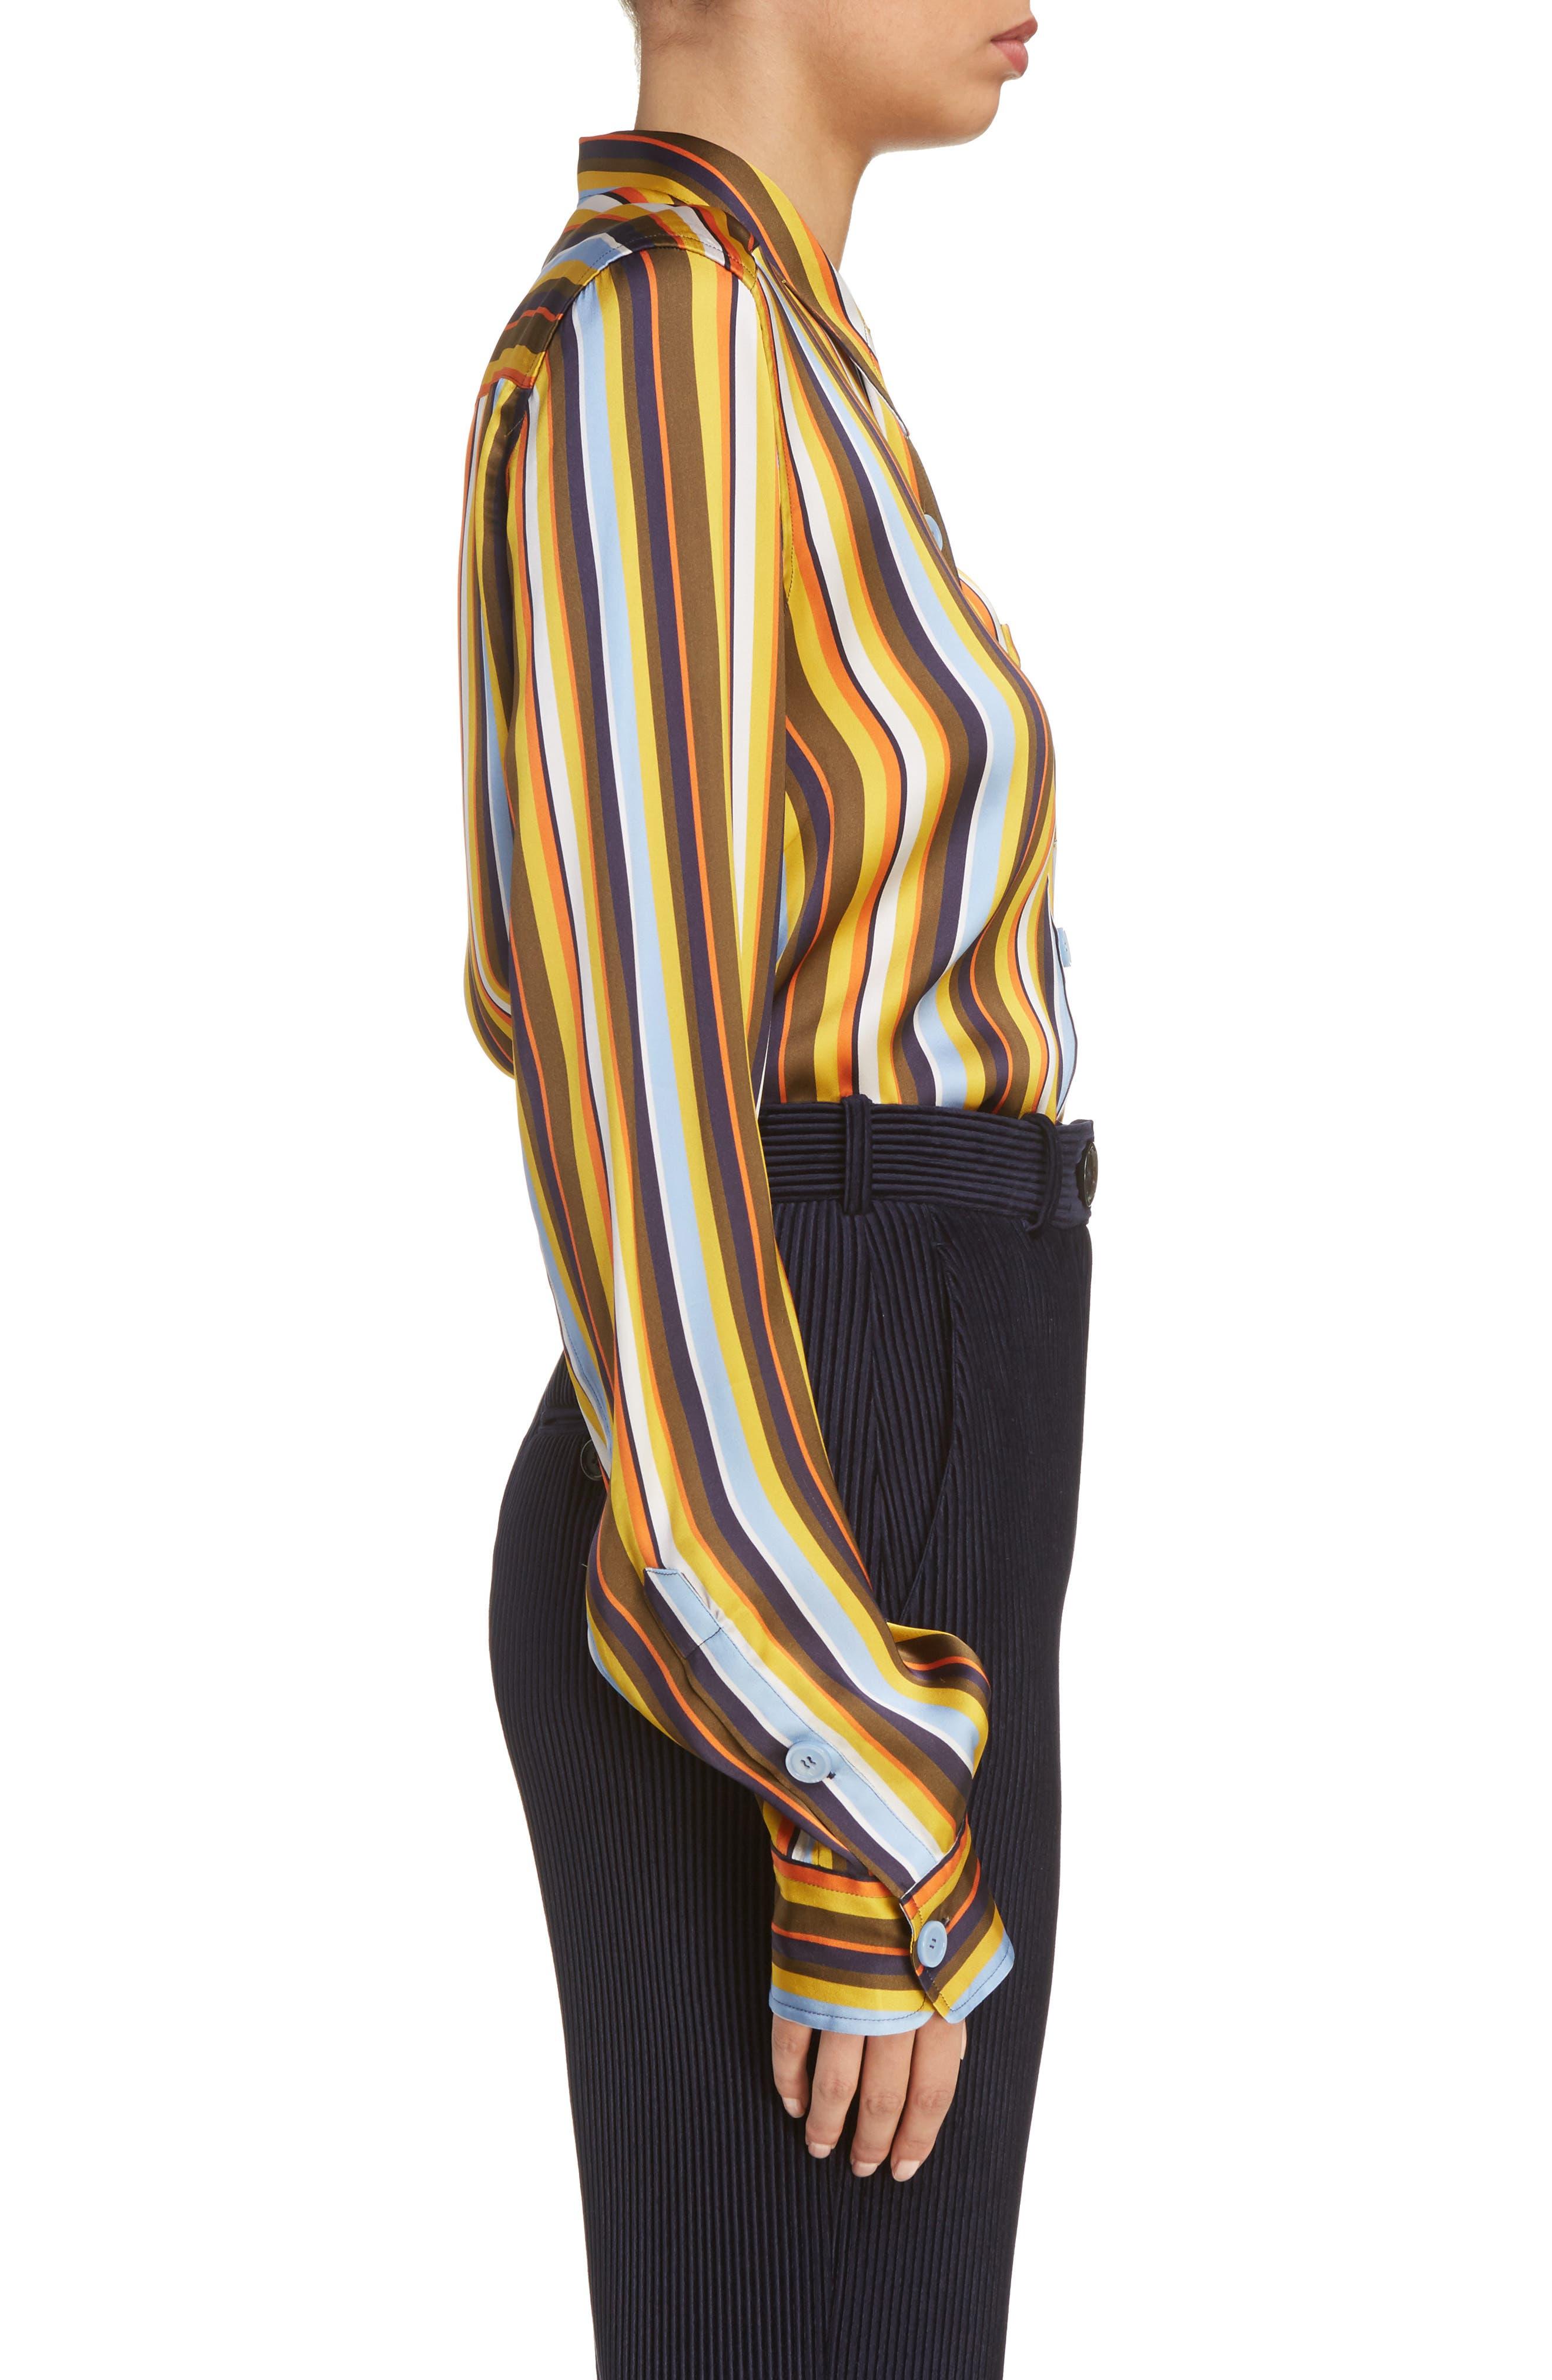 Buse Multistripe Blouse,                             Alternate thumbnail 4, color,                             Multi Stripe Brown